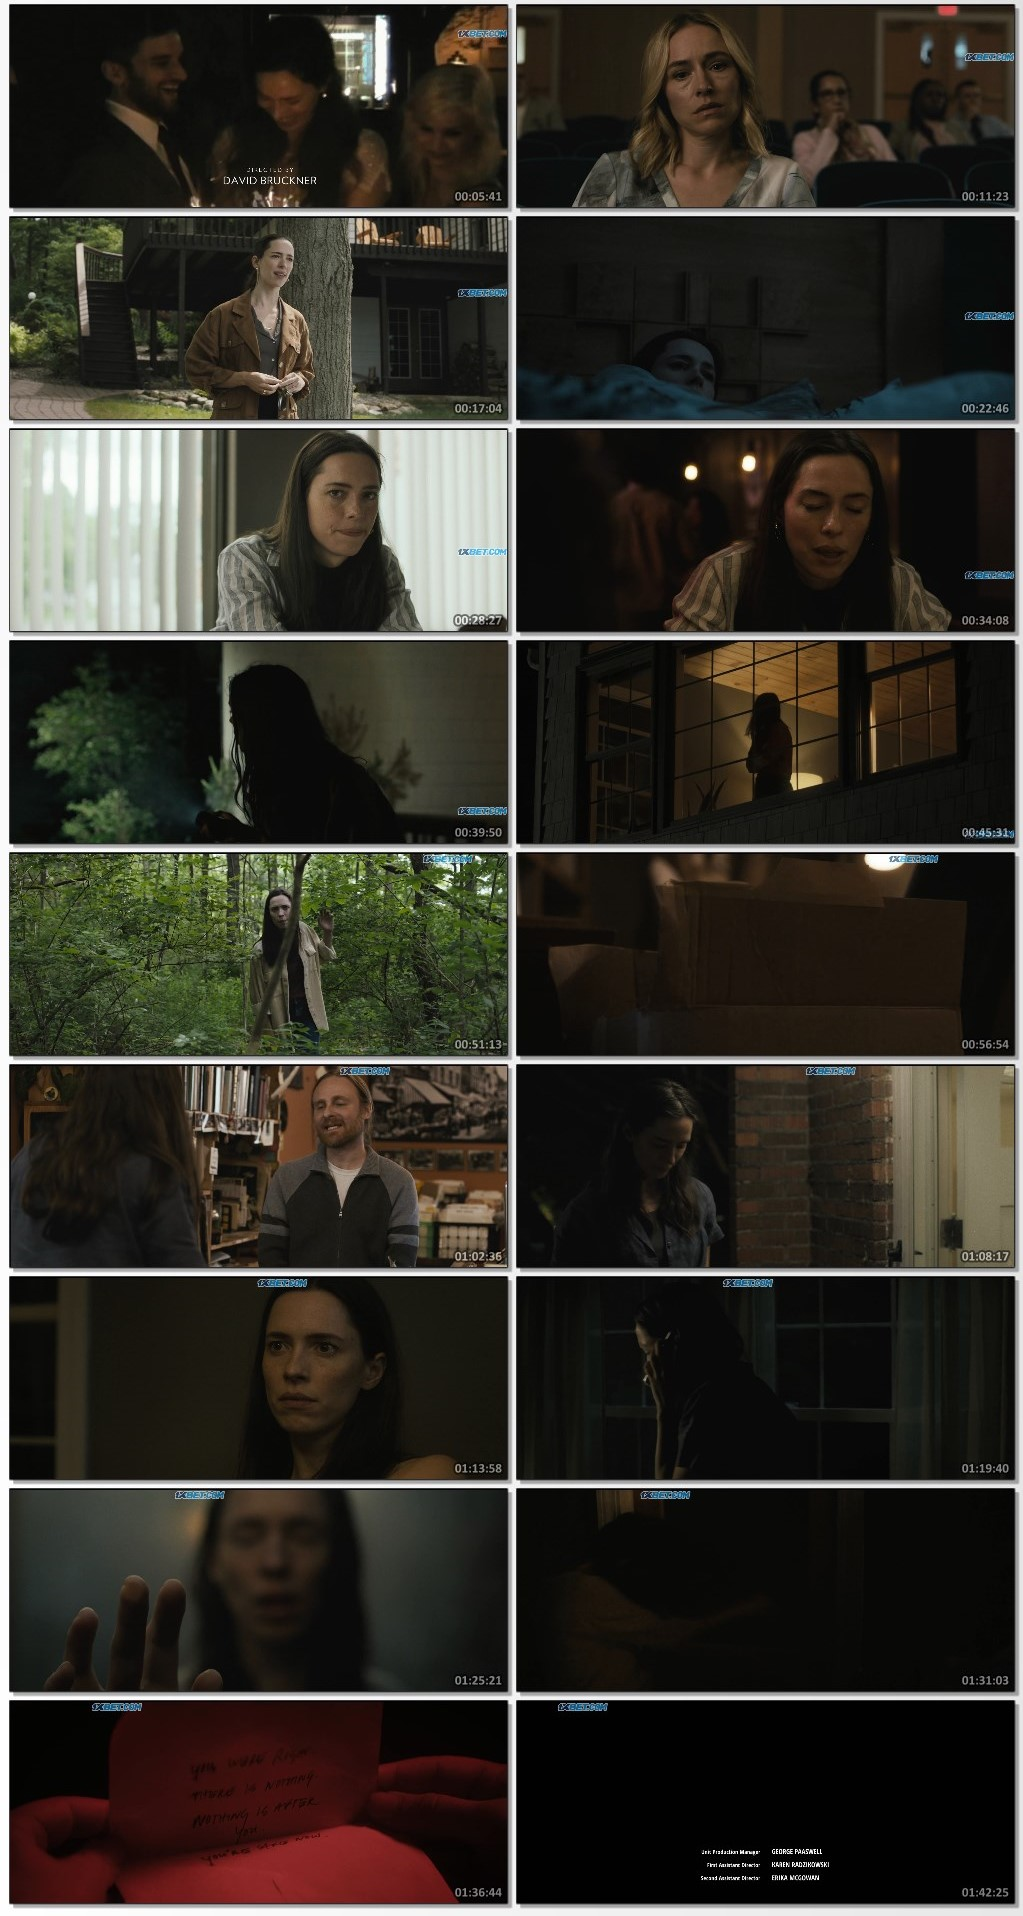 The-Night-House-2021-1080p-WEBRip-HINDI-HQ-DUB-www-7-Star-HD-Wales-mkv-thumbs261ce93231767afe